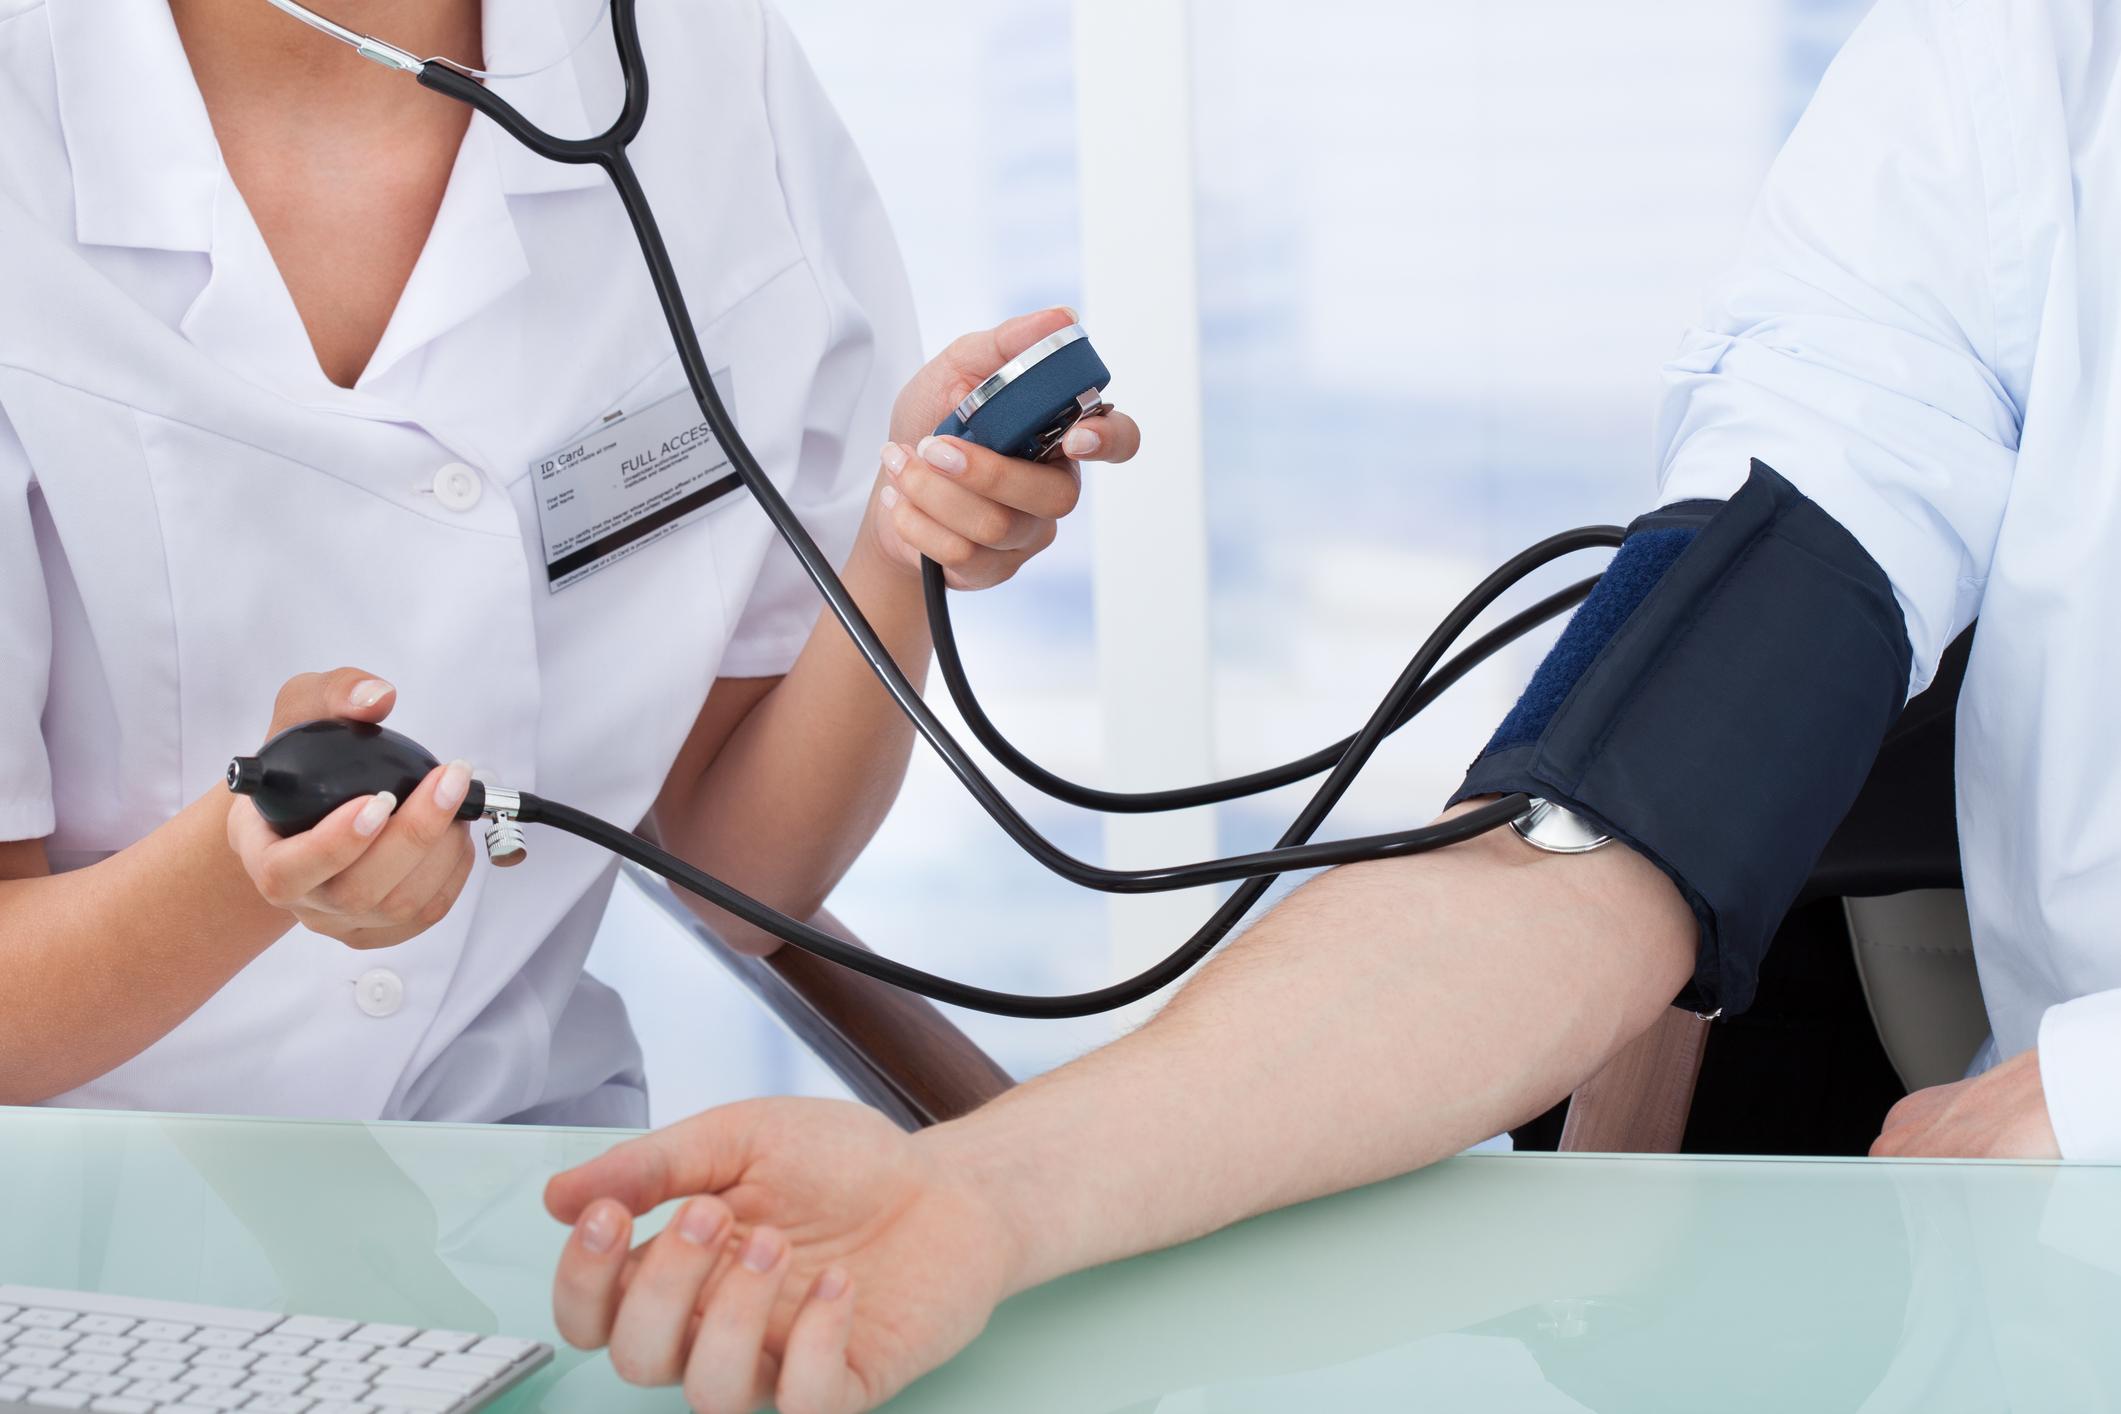 Pasient får målt blodtrykket